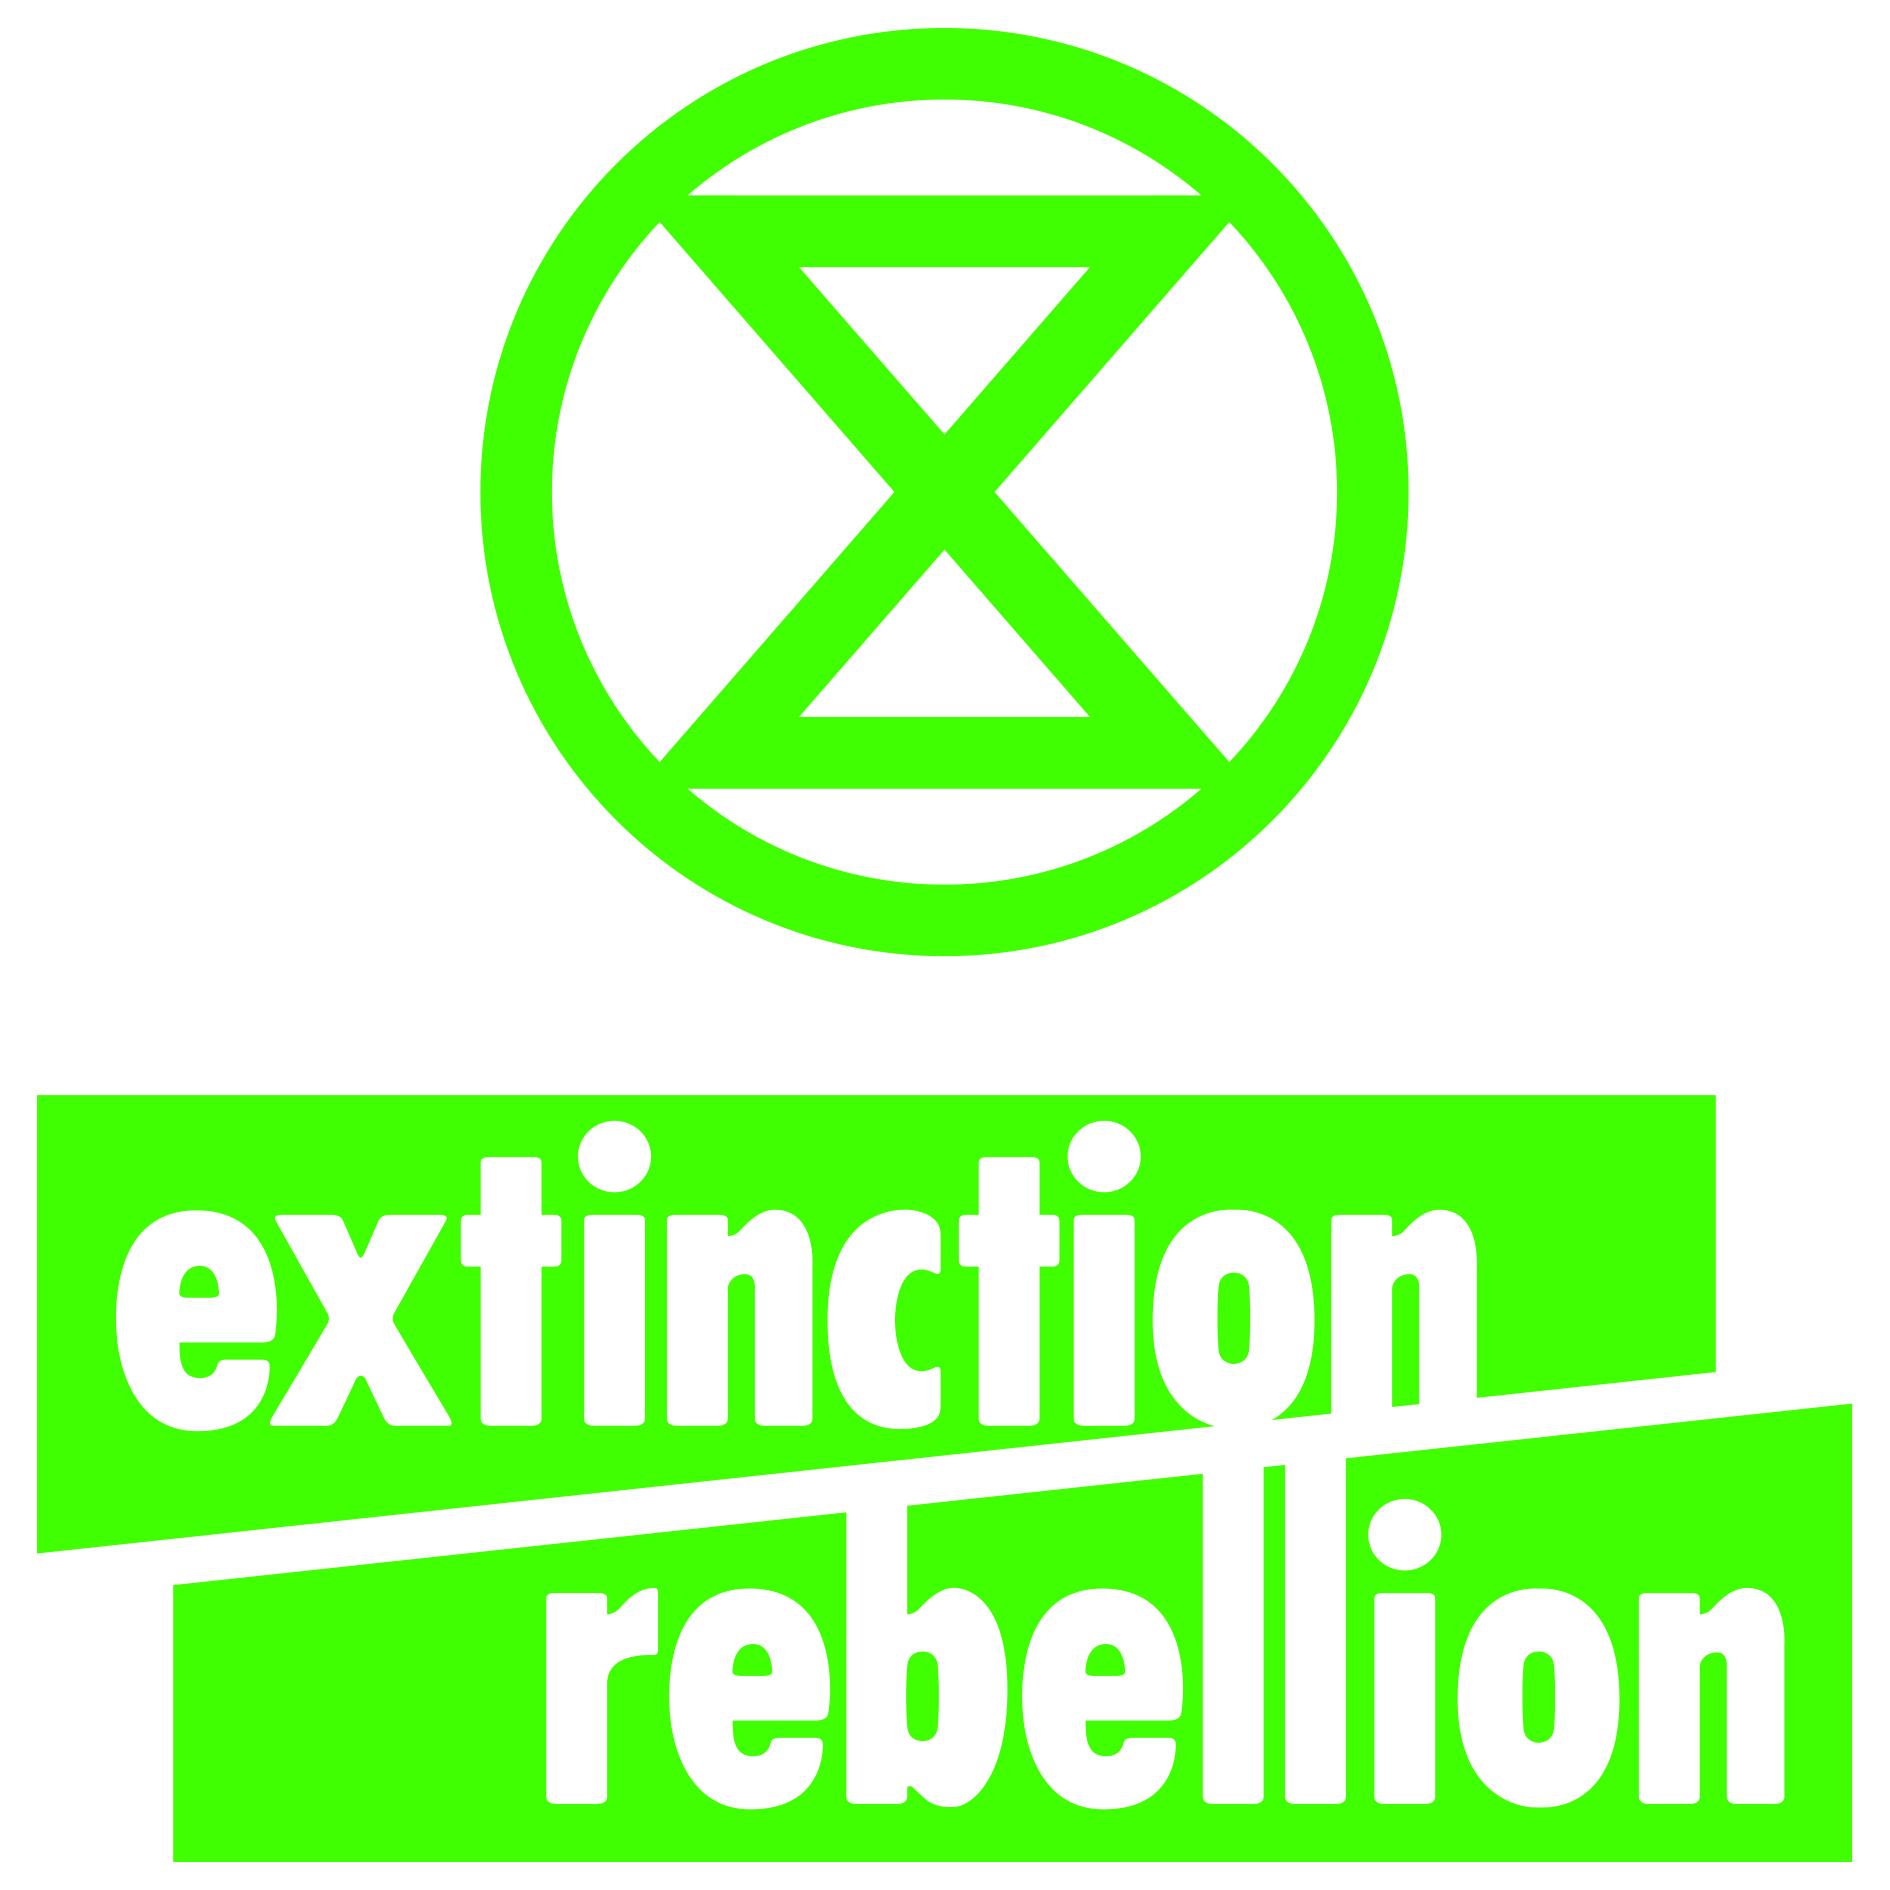 Extinction Rebellion Atlanta